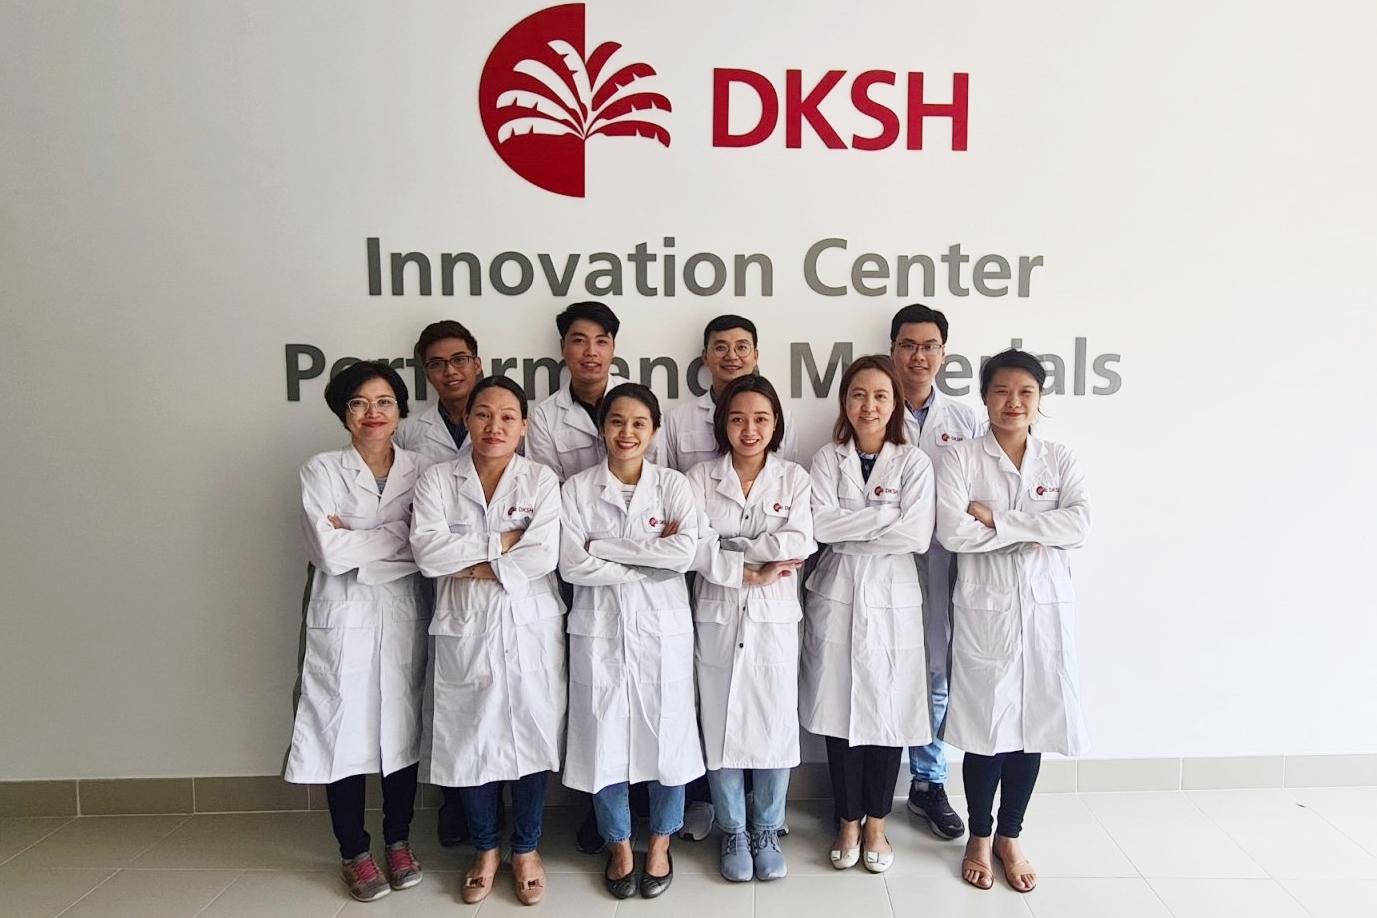 DKSH upgrades its Performance Materials innovation centers in Vietnam